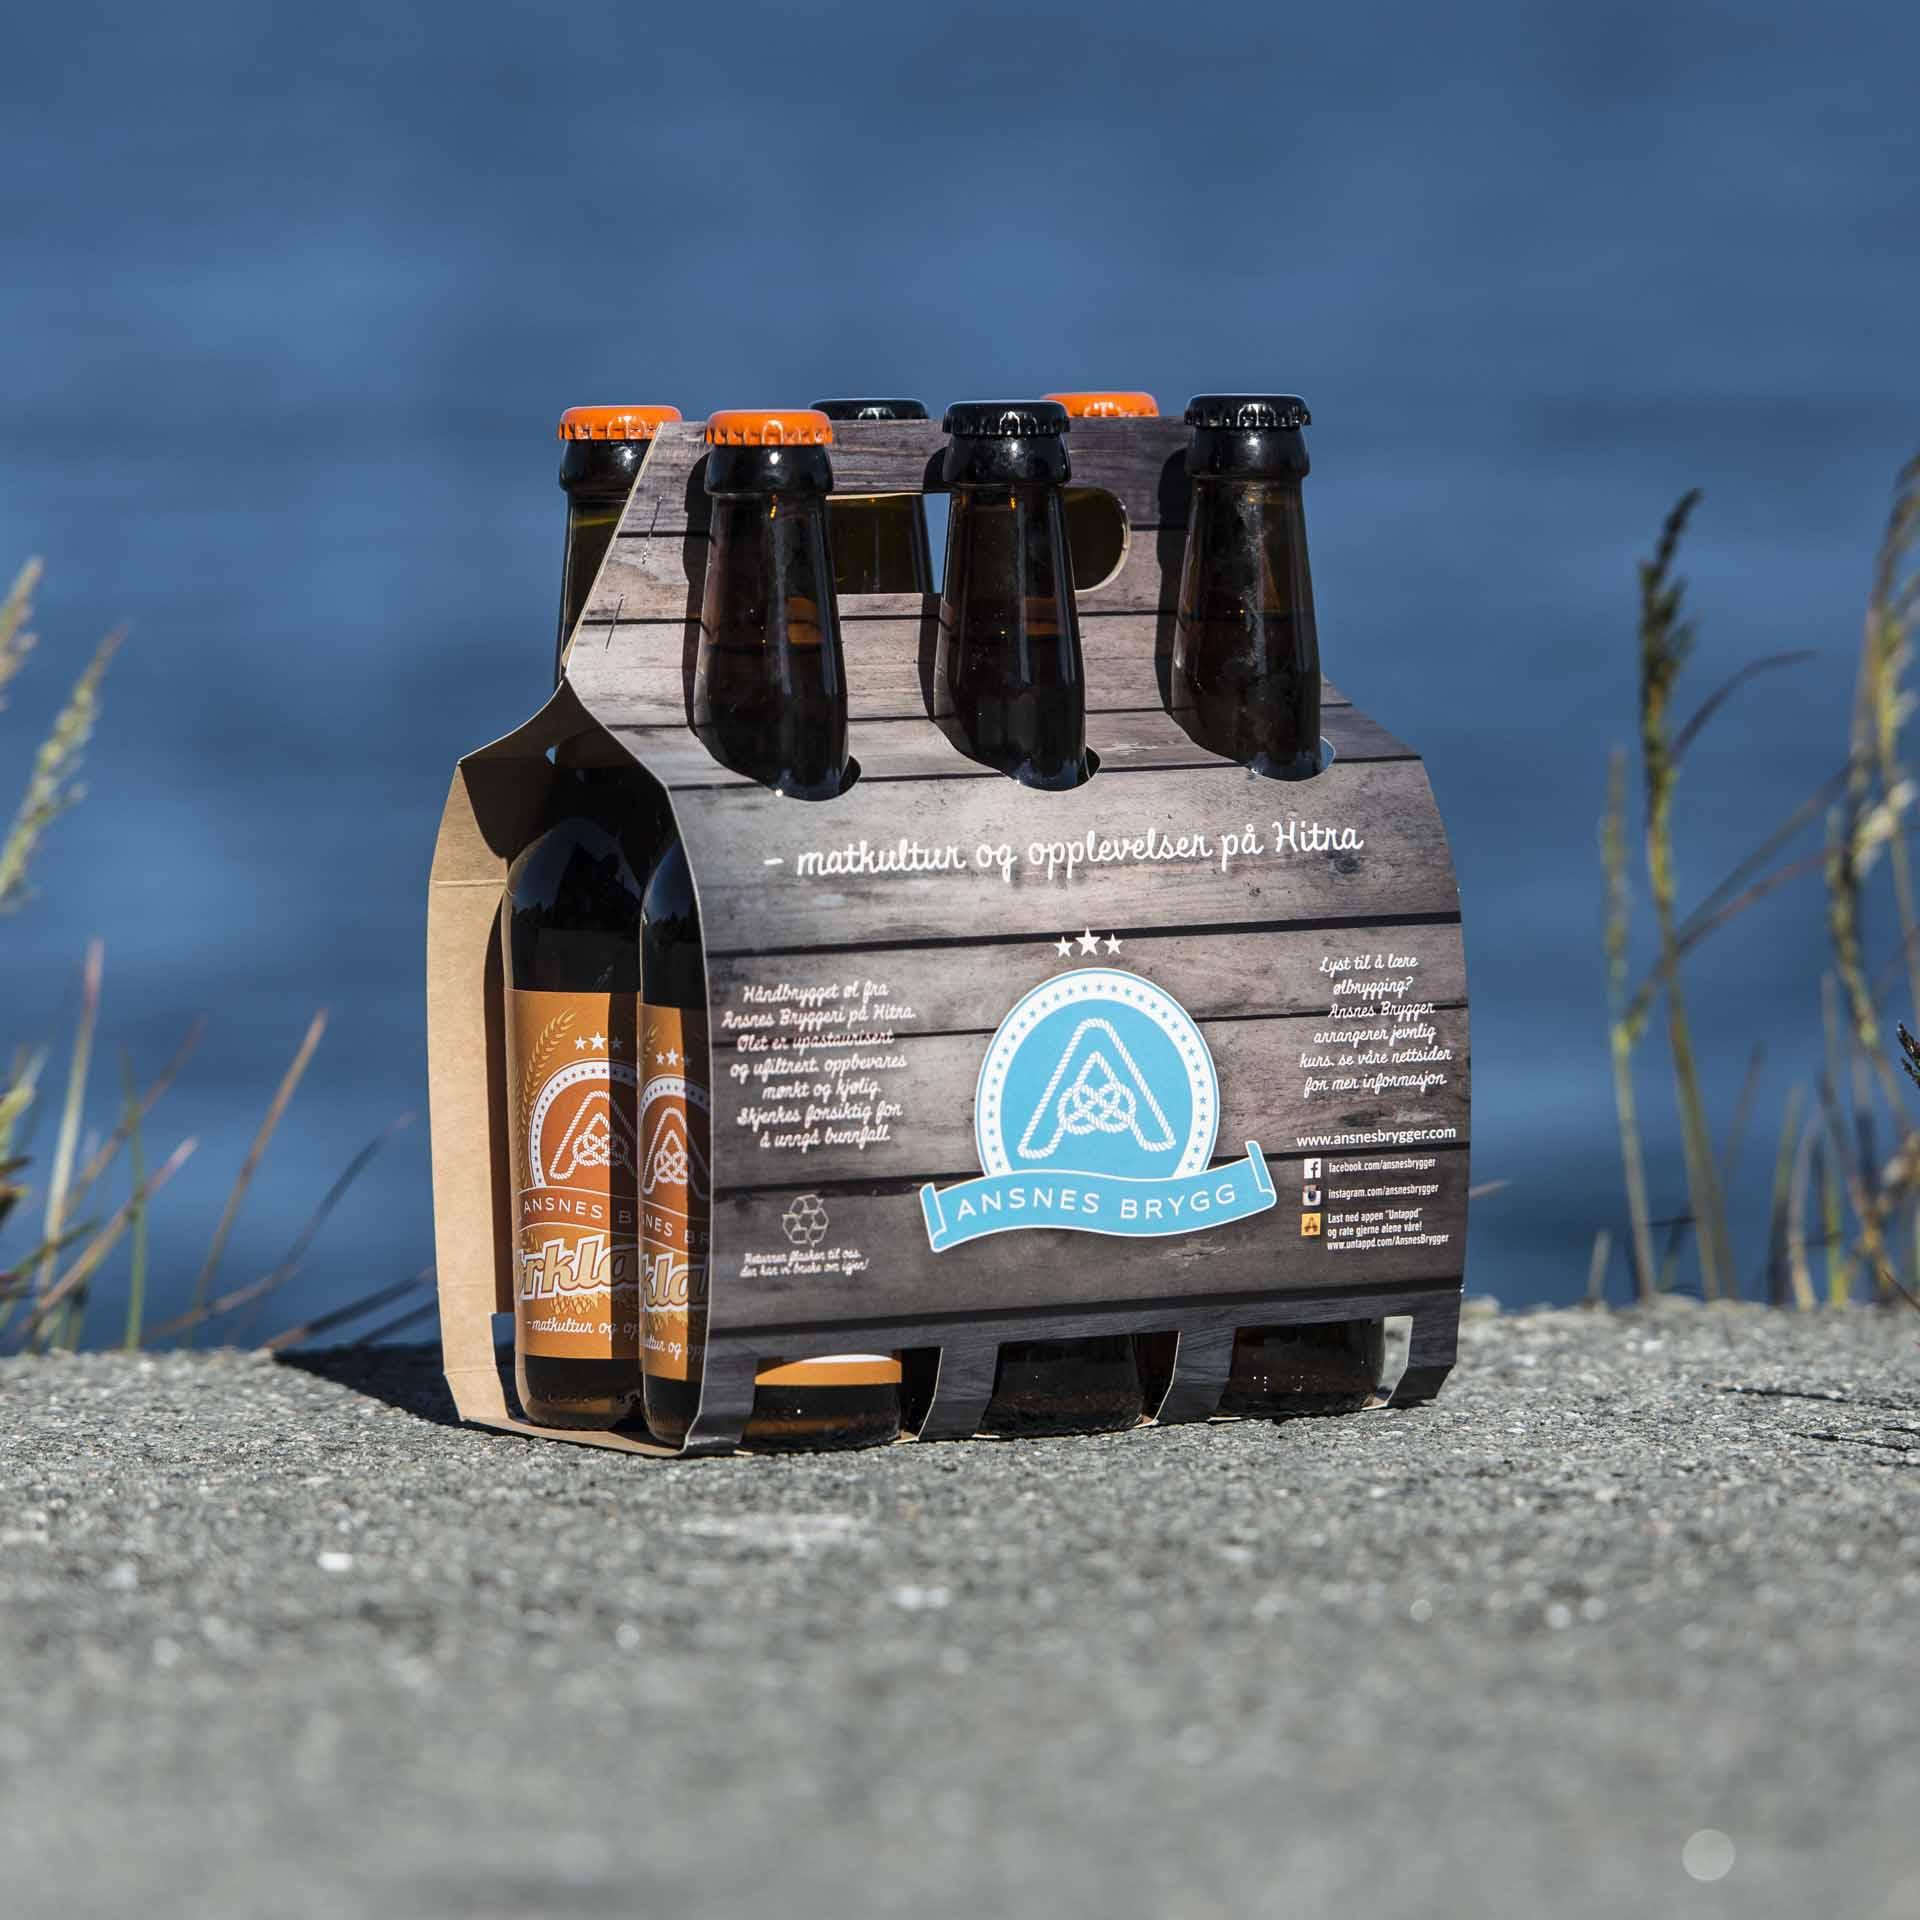 øl-8002178.jpg